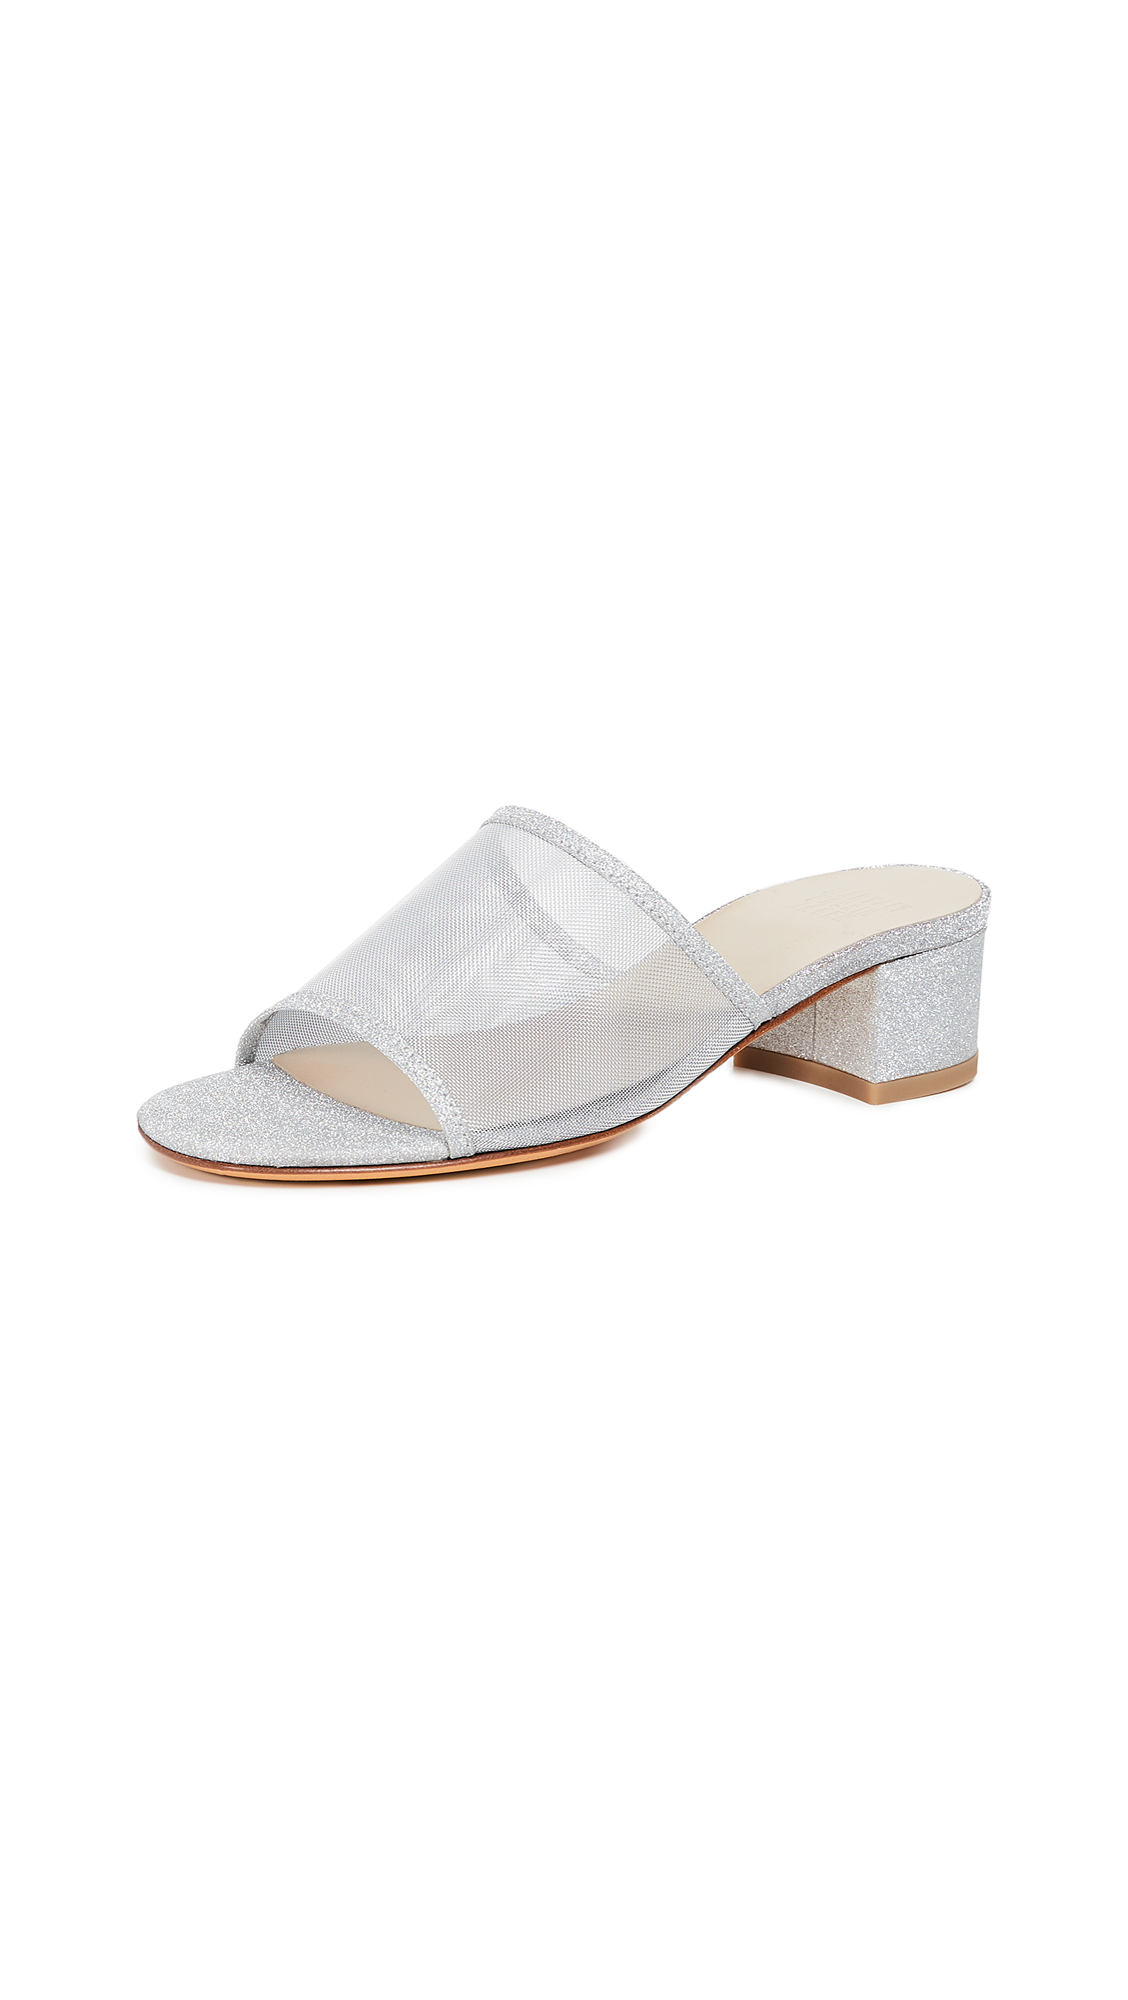 Maryam Nassir Zadeh Sophie Mesh Sandals - Silver Sparkle